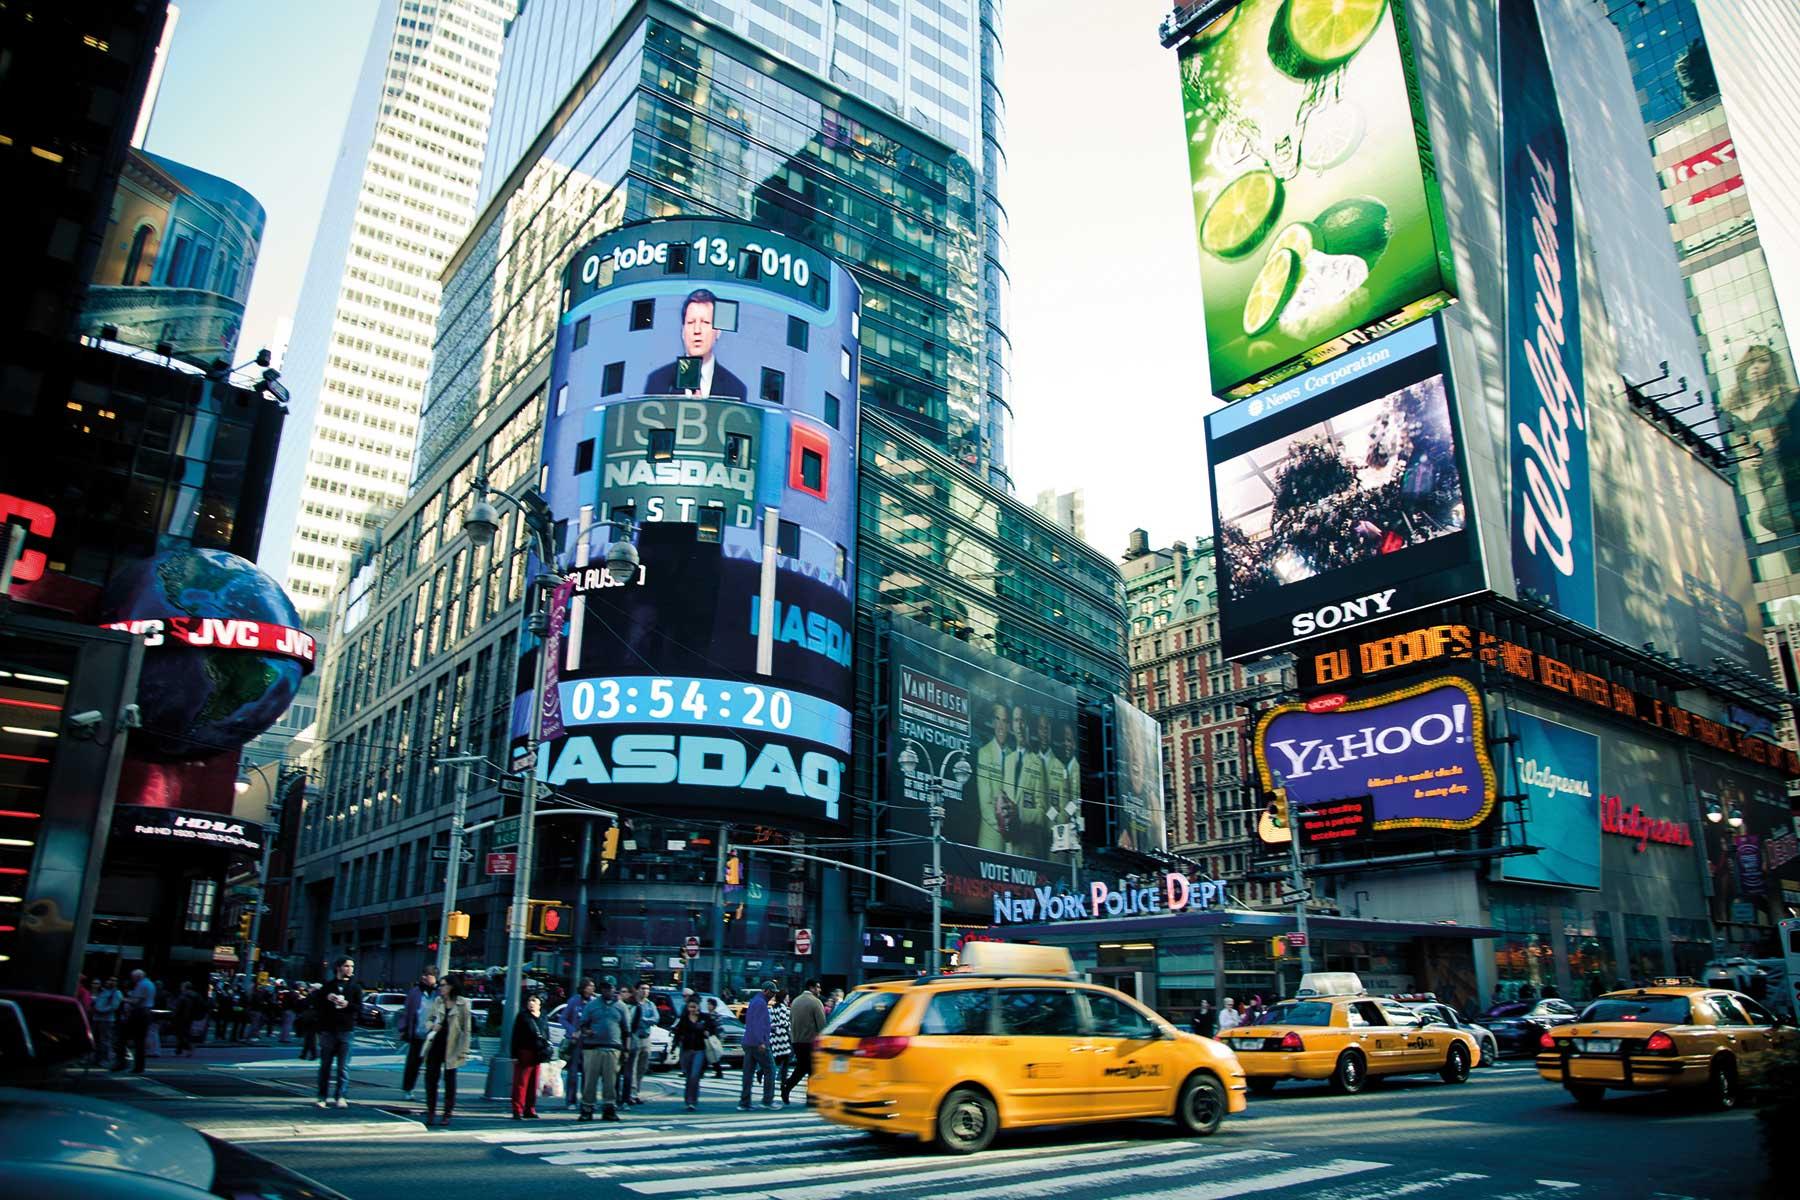 Drew Times Square